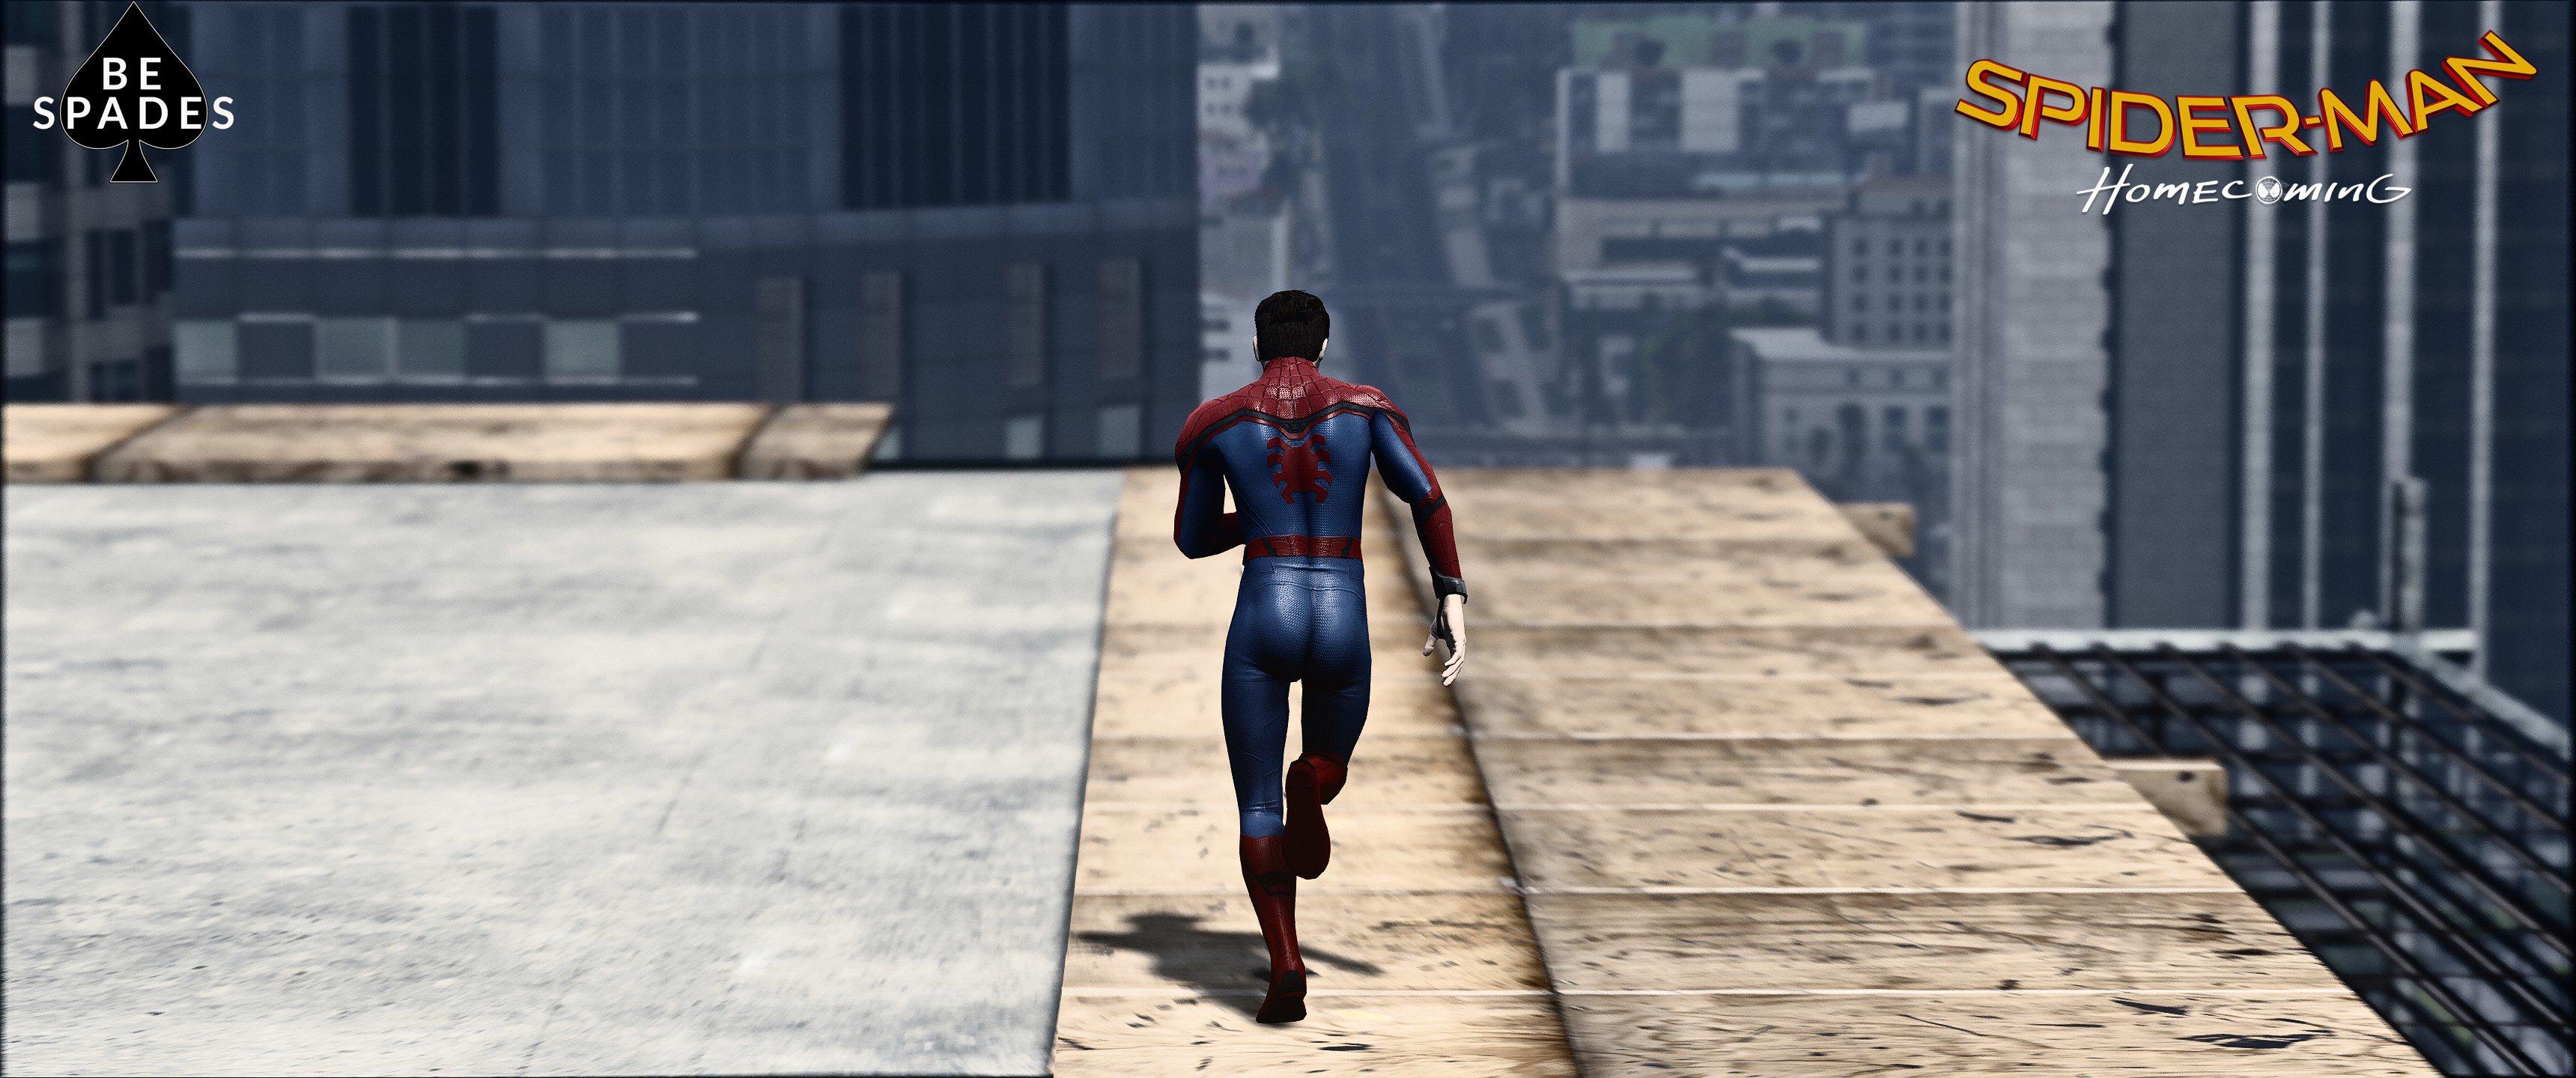 Spider-Man (Civil War/Homecoming) [Add-On] - GTA5-Mods com